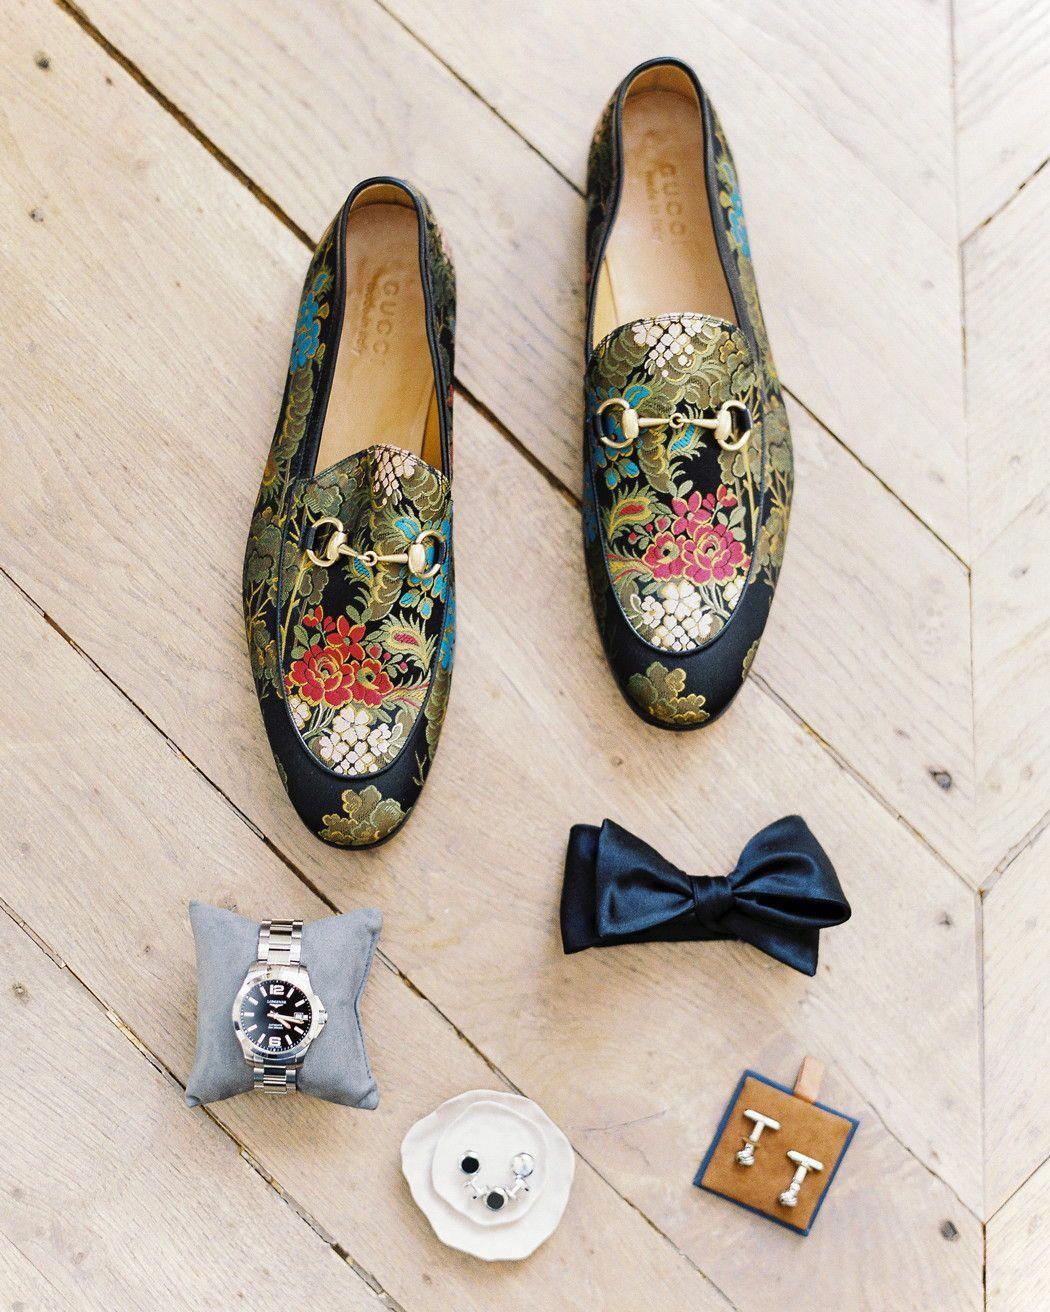 A Worldly Wedding at a Glamorous Estate in Charette-Varennes, France | Martha Stewart Weddings